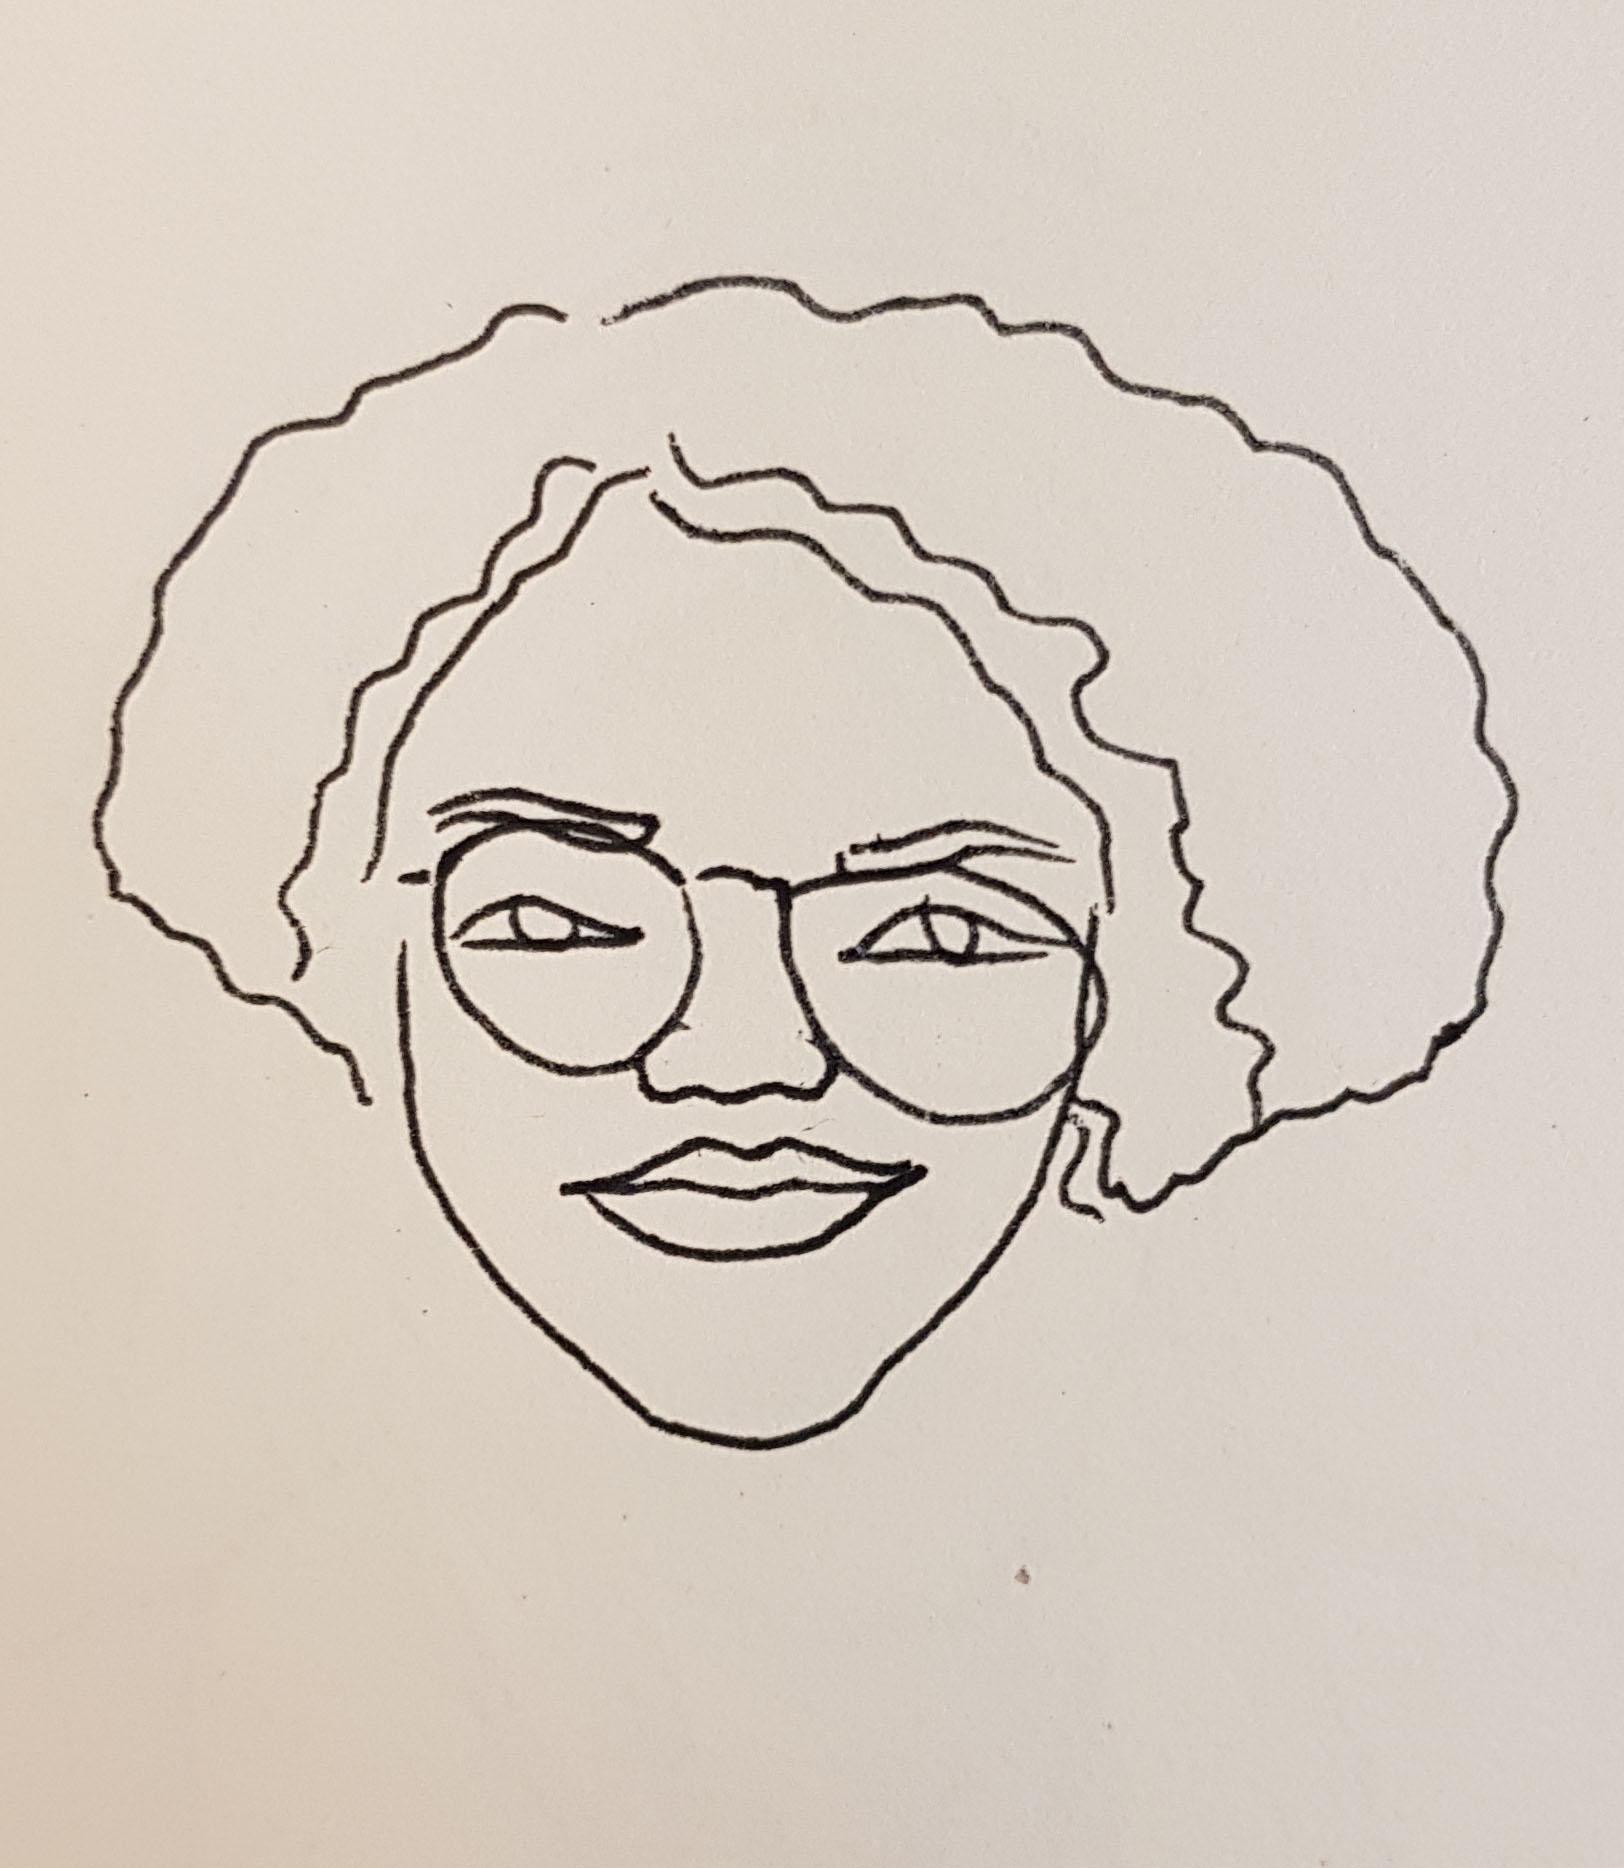 lic. phil. Jovita dos Santos Pinto